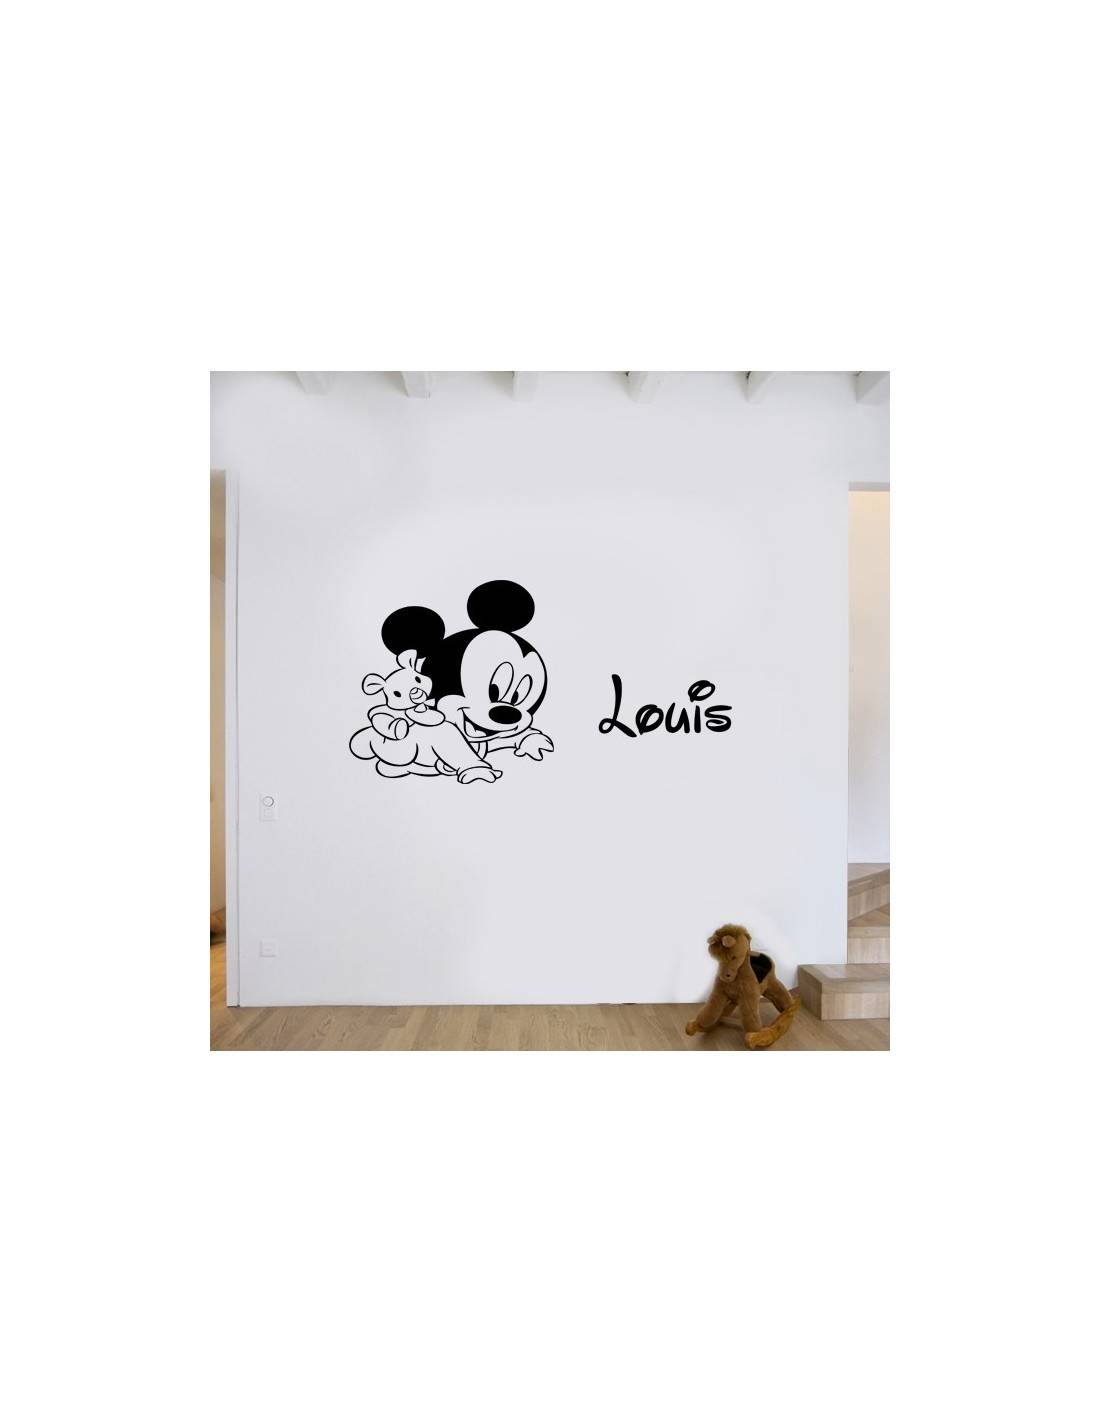 stickers d co enfant mickey personnalis stickers enfant pas cher. Black Bedroom Furniture Sets. Home Design Ideas